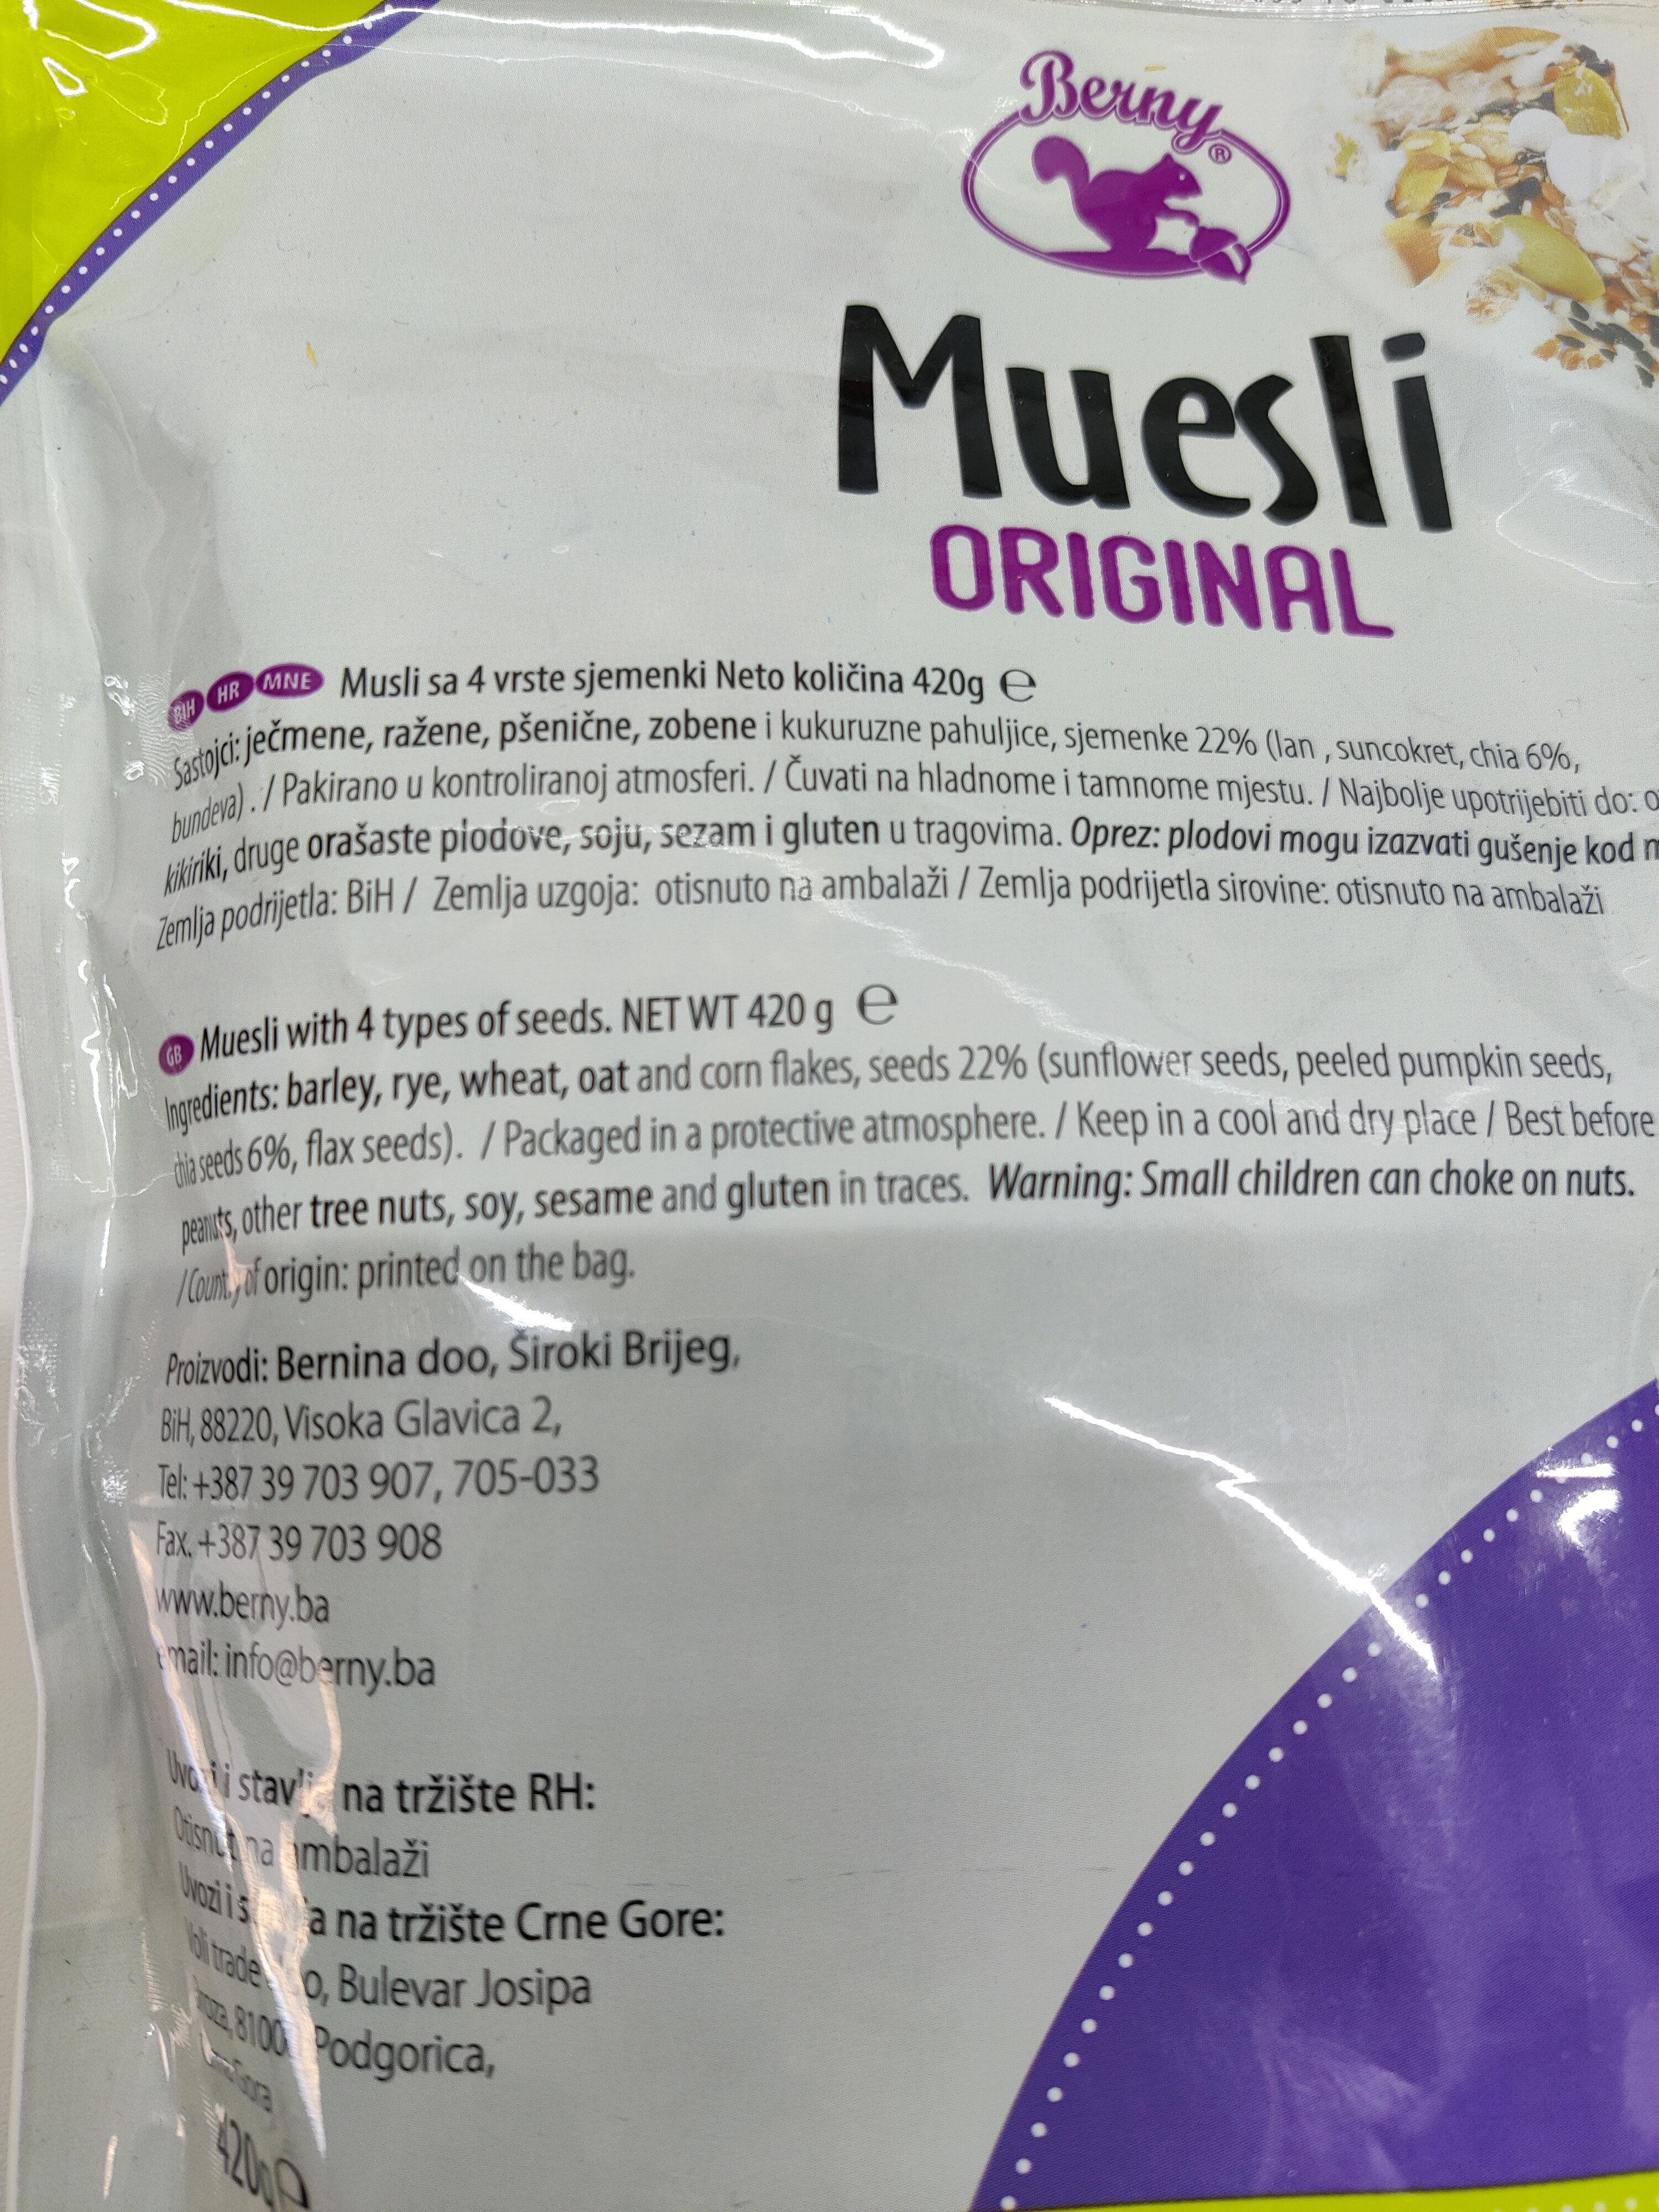 Muesli with 4 types of seeds - 成分 - en